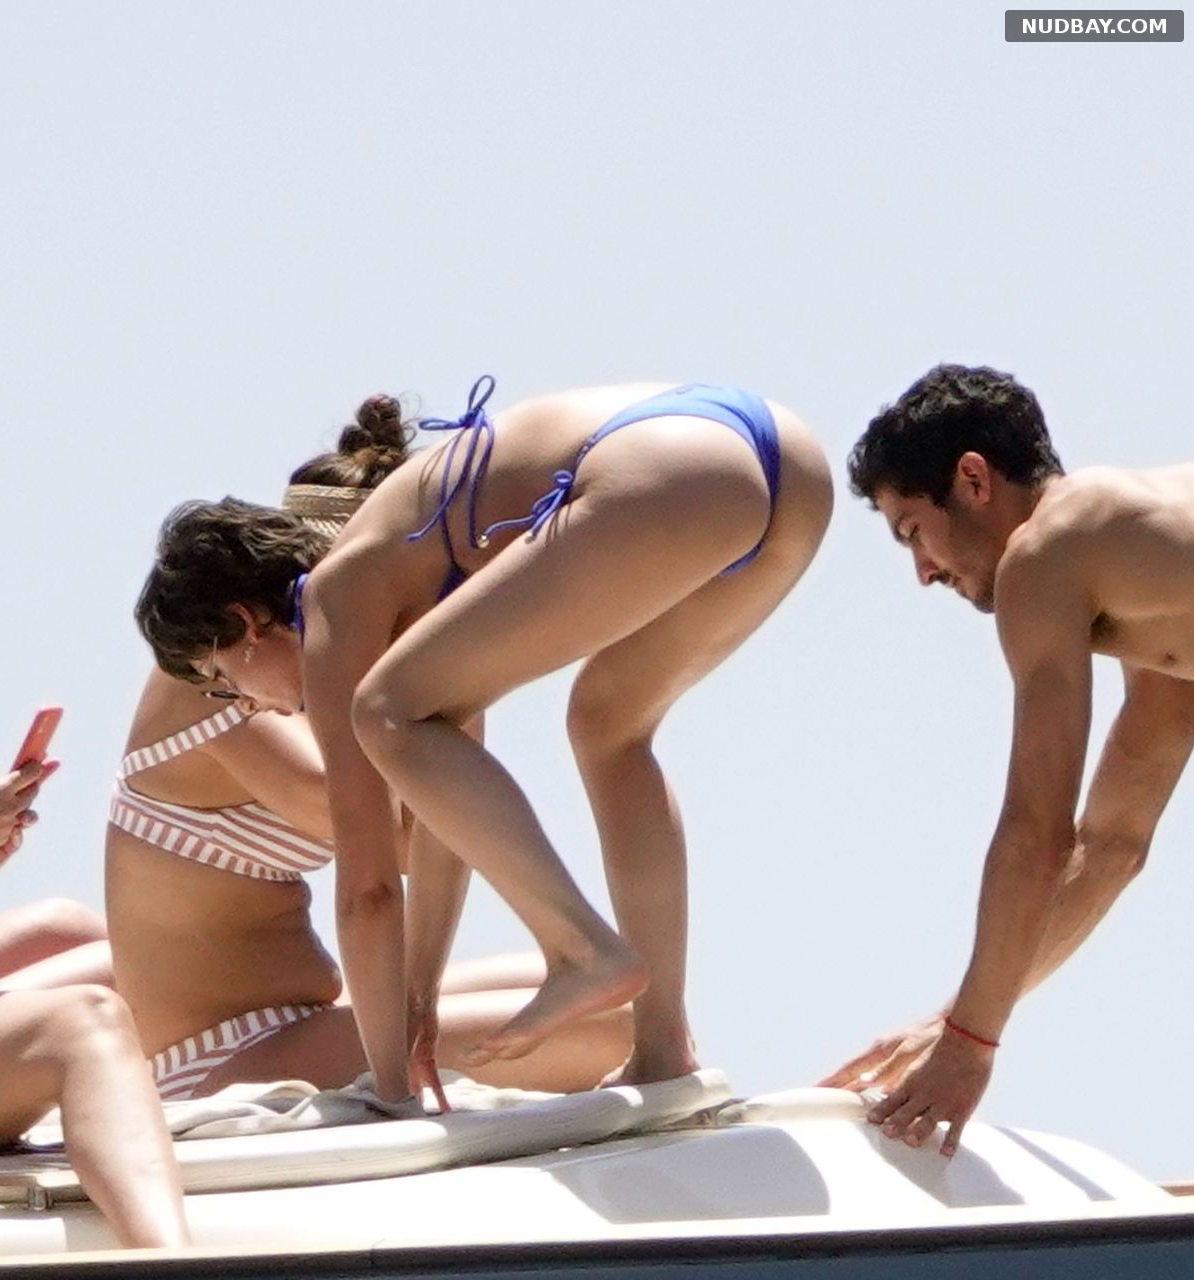 Ursula Corbero pussy on holiday on the island of Capri Jun 14 2019